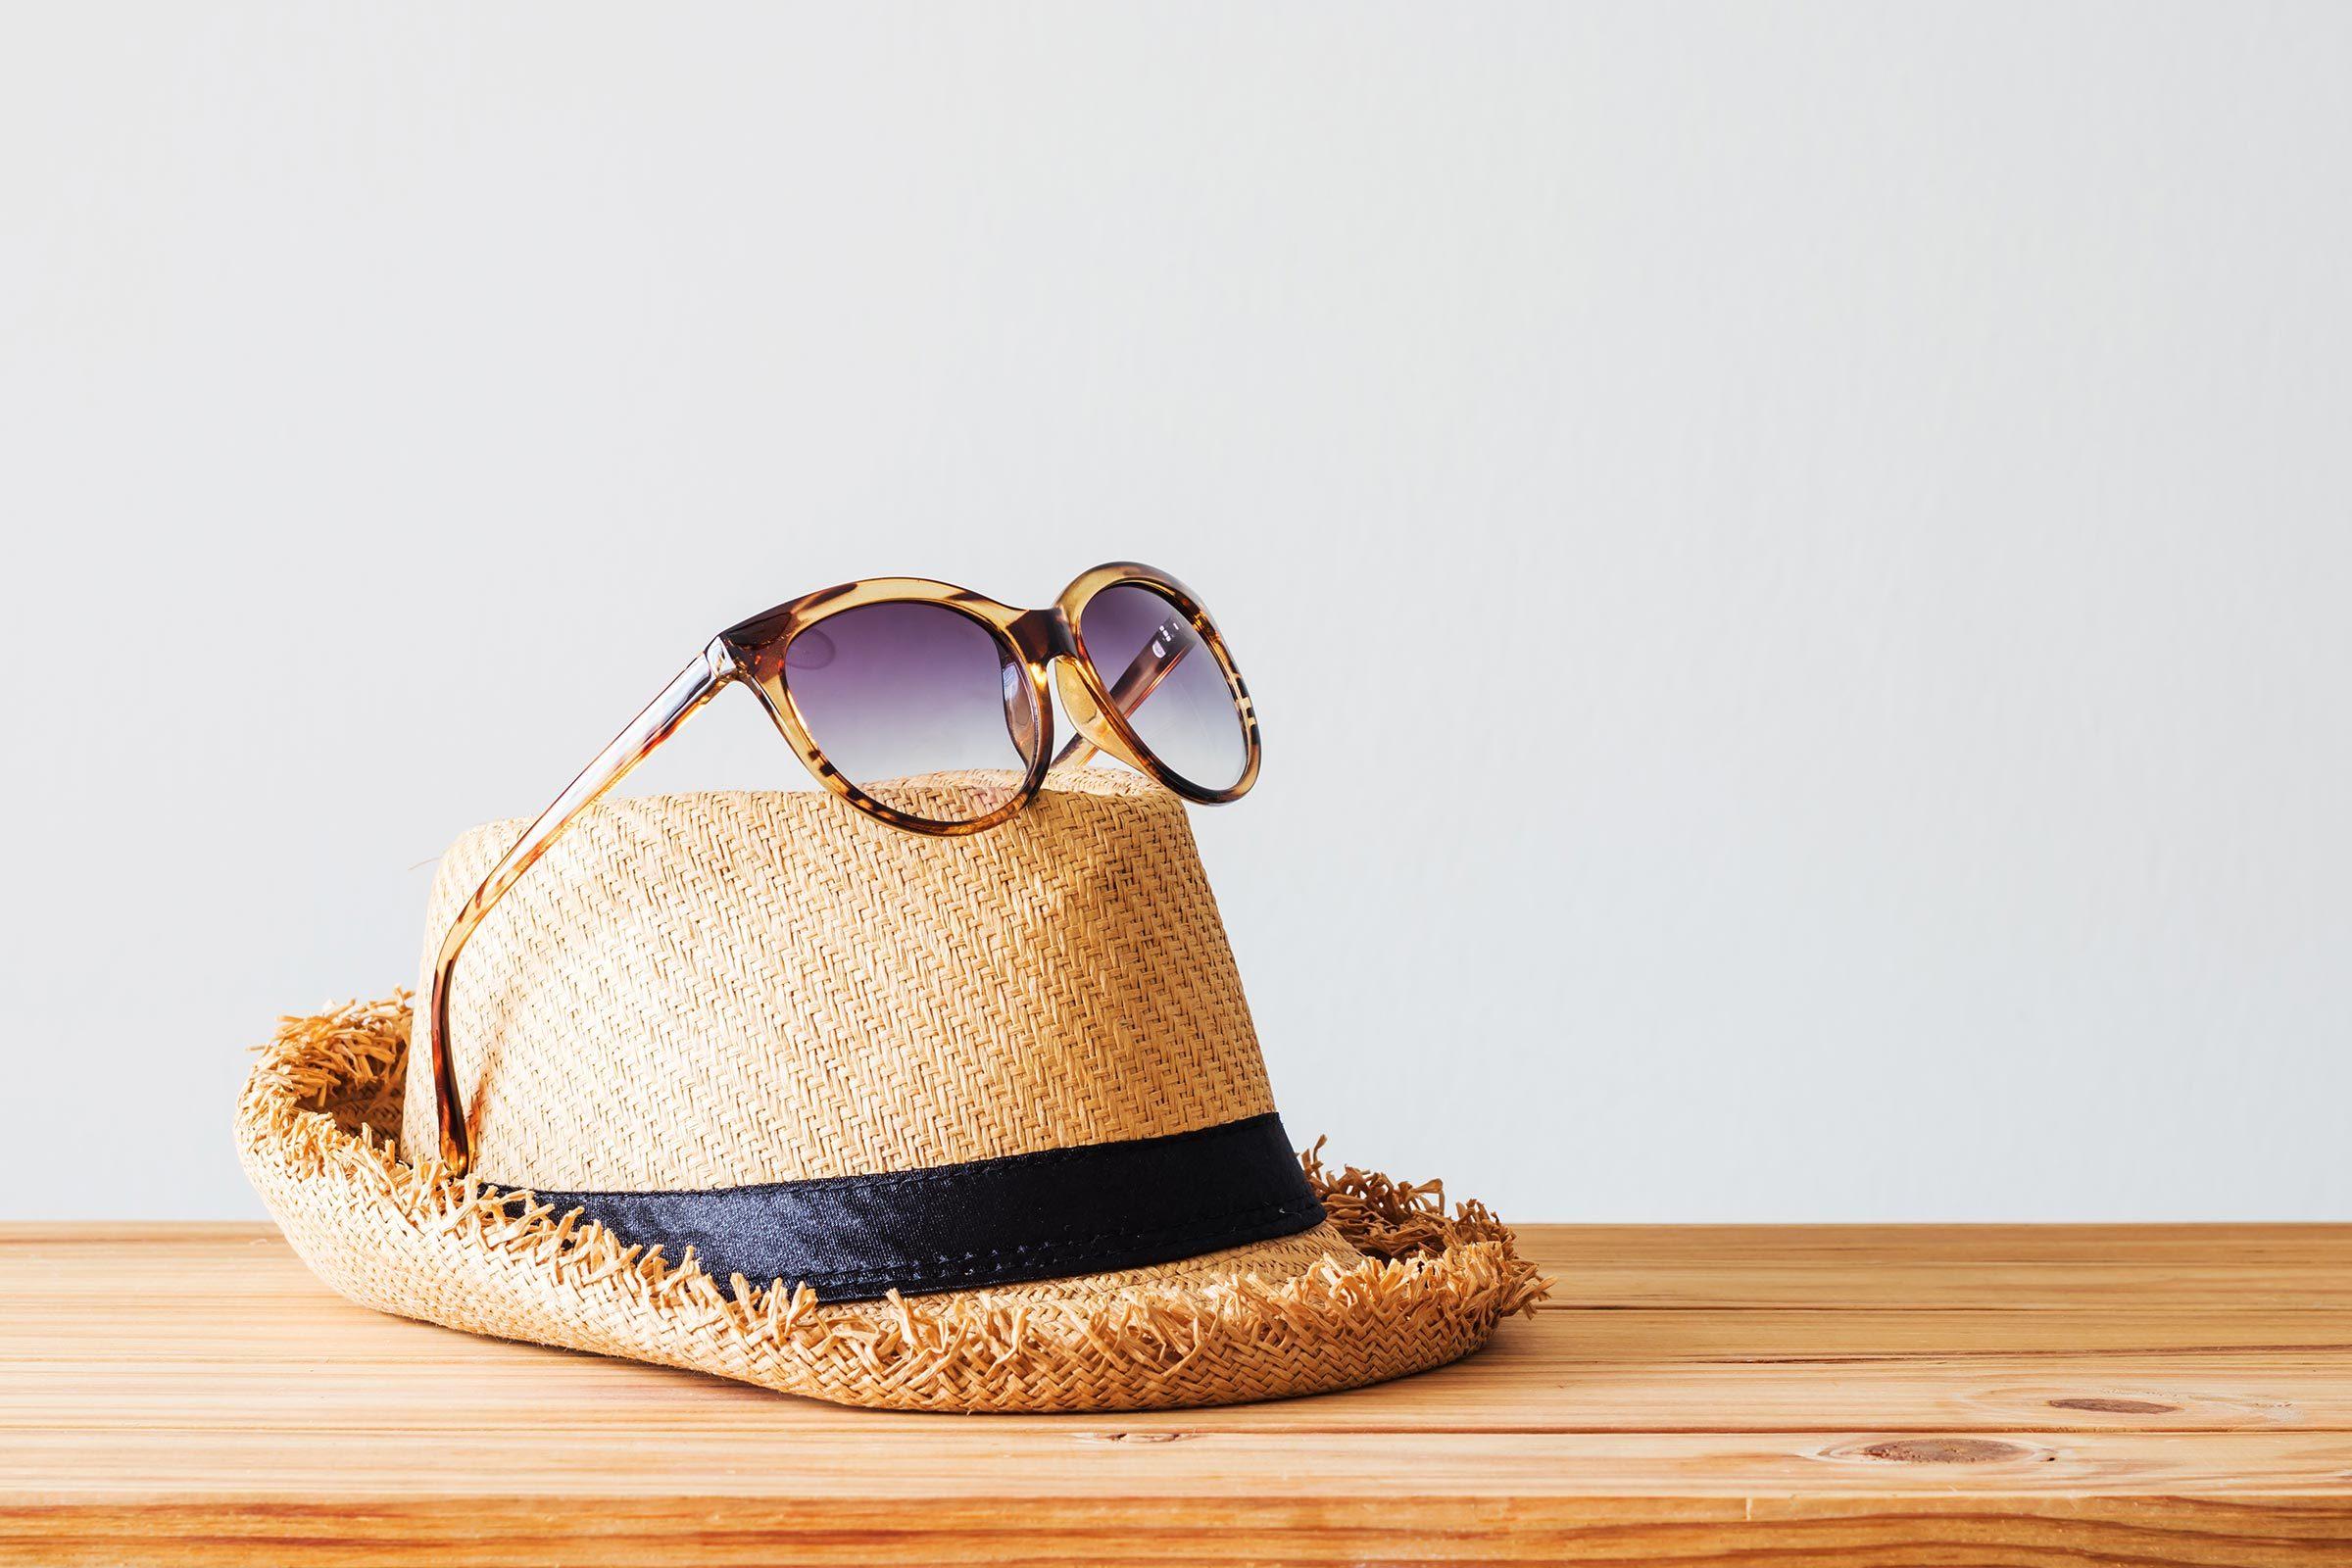 sunglasses sun hat